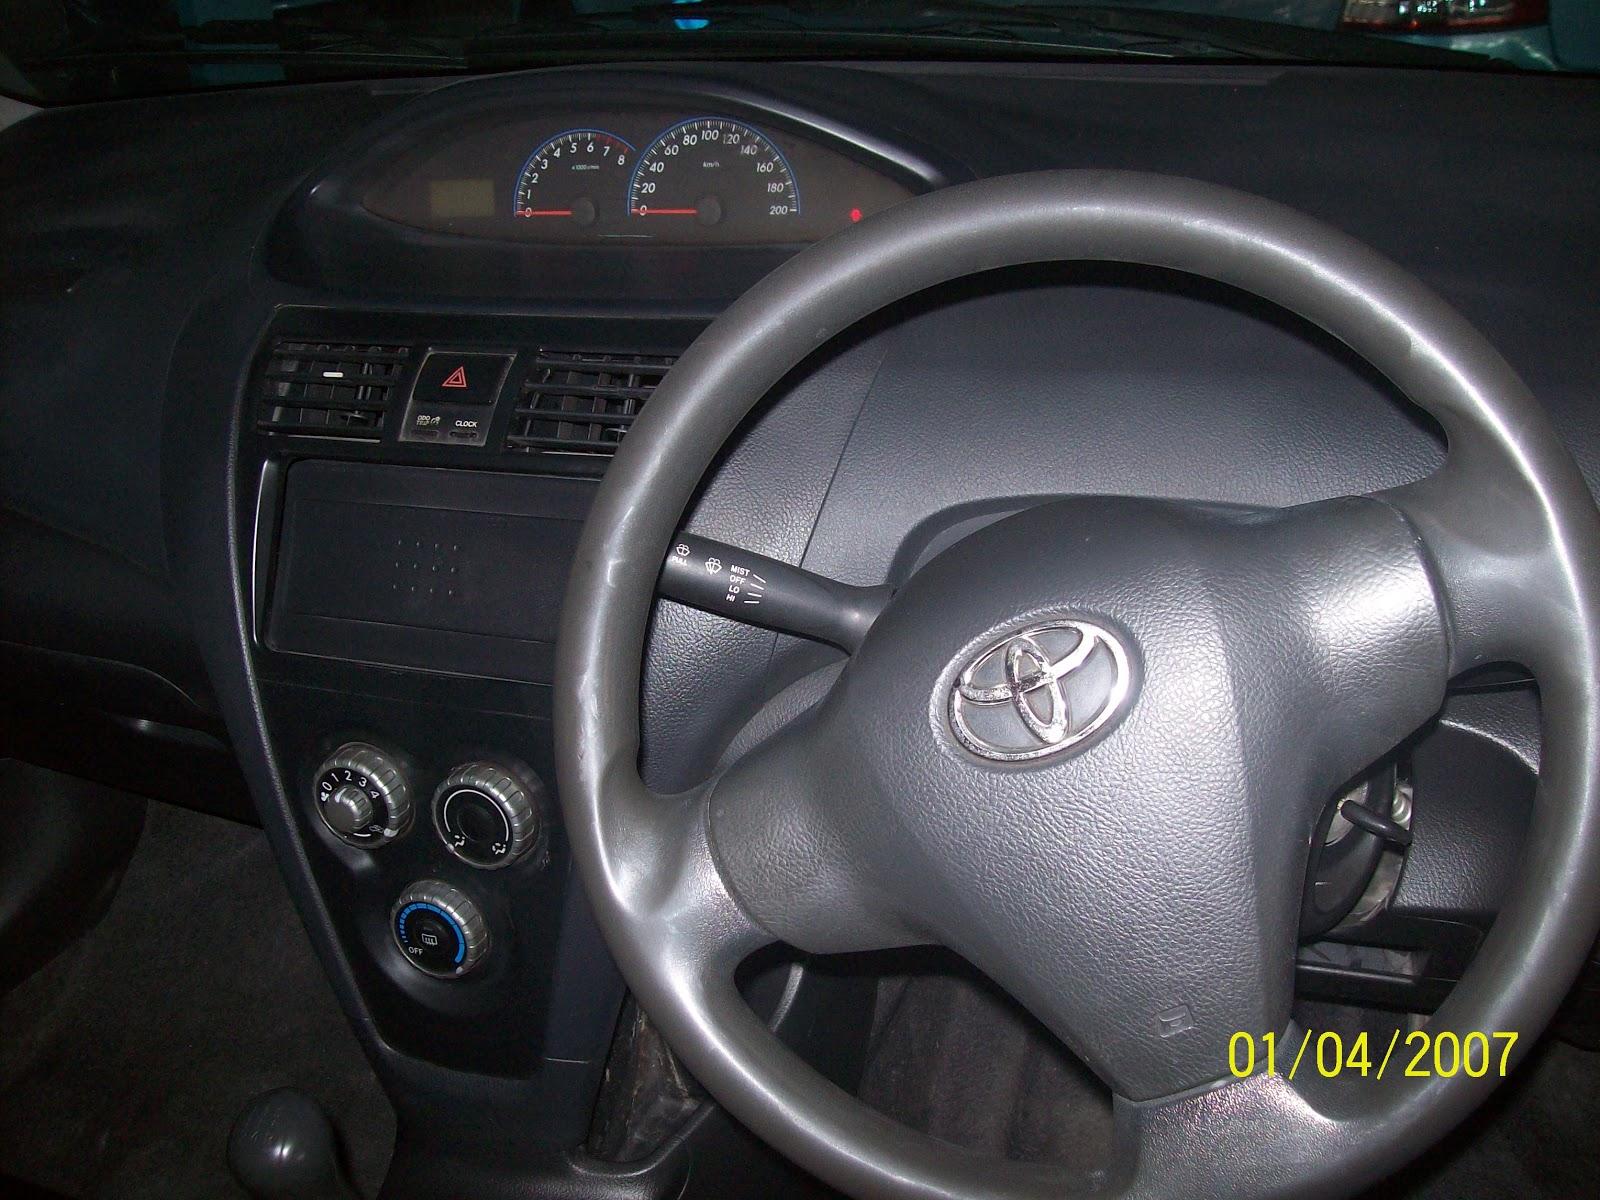 jual mobil new limo vios tahun 2007 ex taksi blue bird jual mobil ex taks. Black Bedroom Furniture Sets. Home Design Ideas